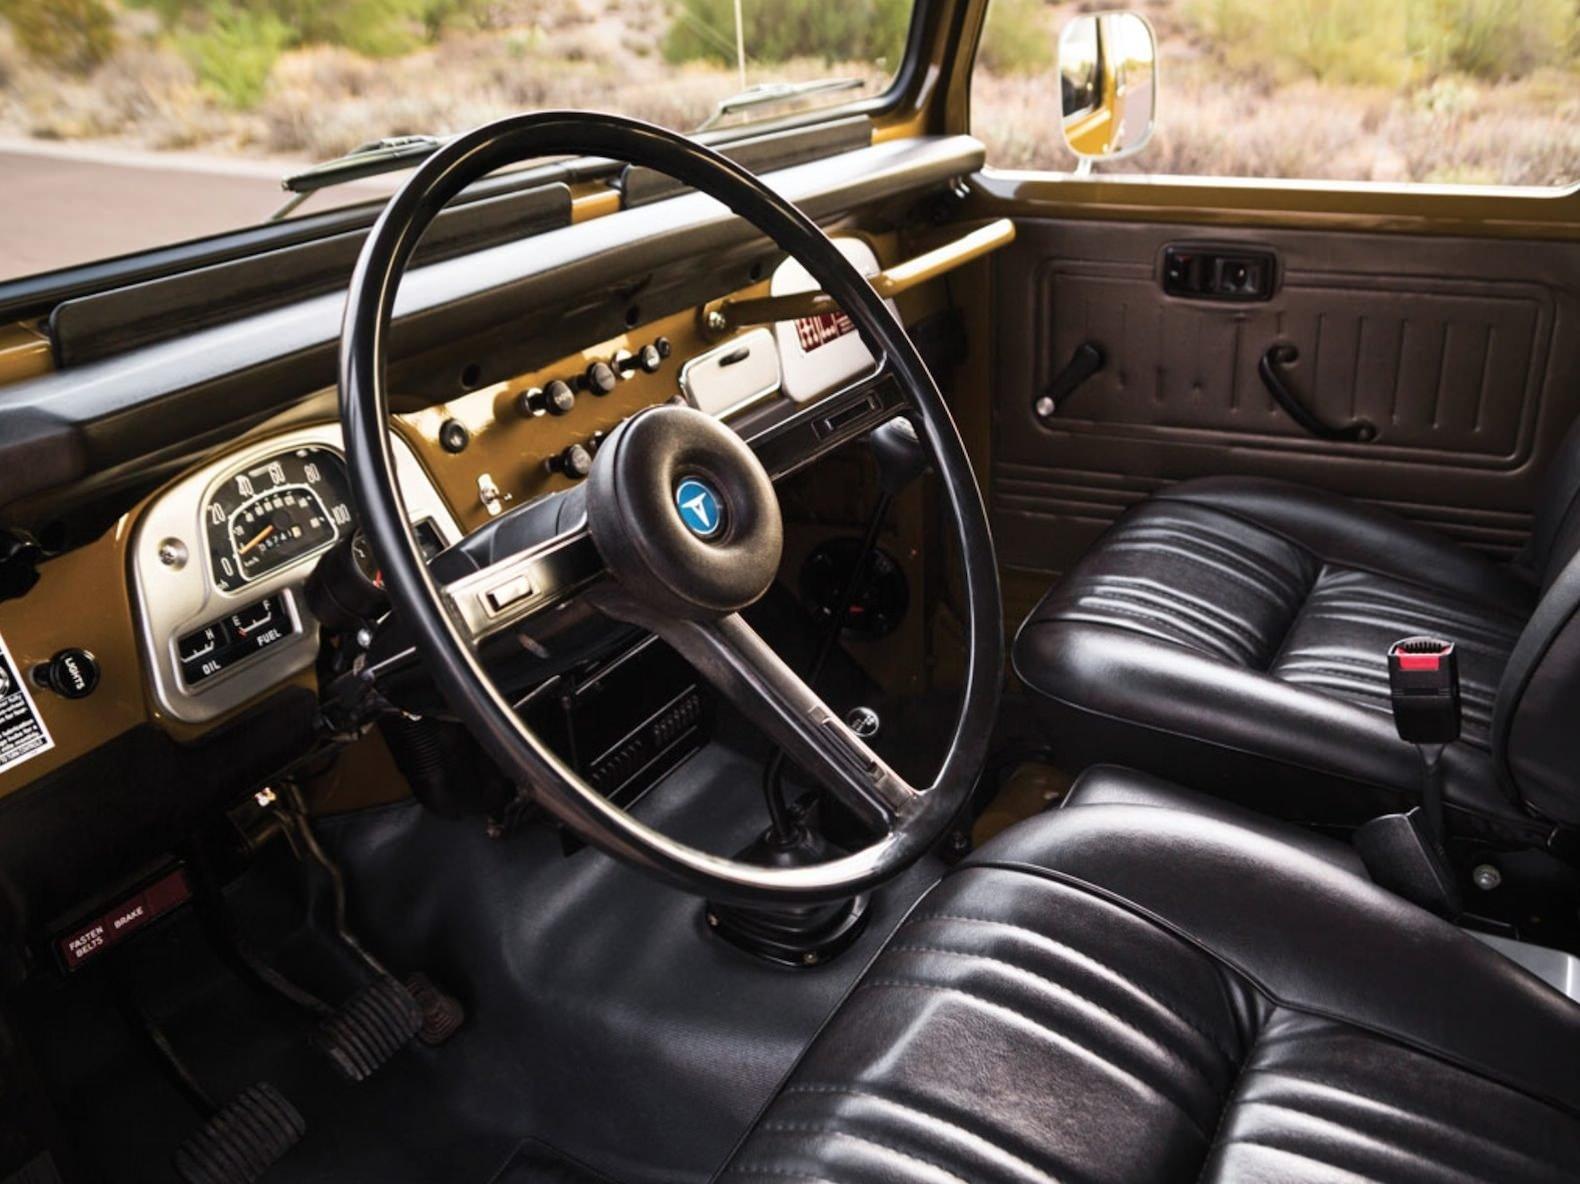 1977 Toyota FJ40 Land Cruiser